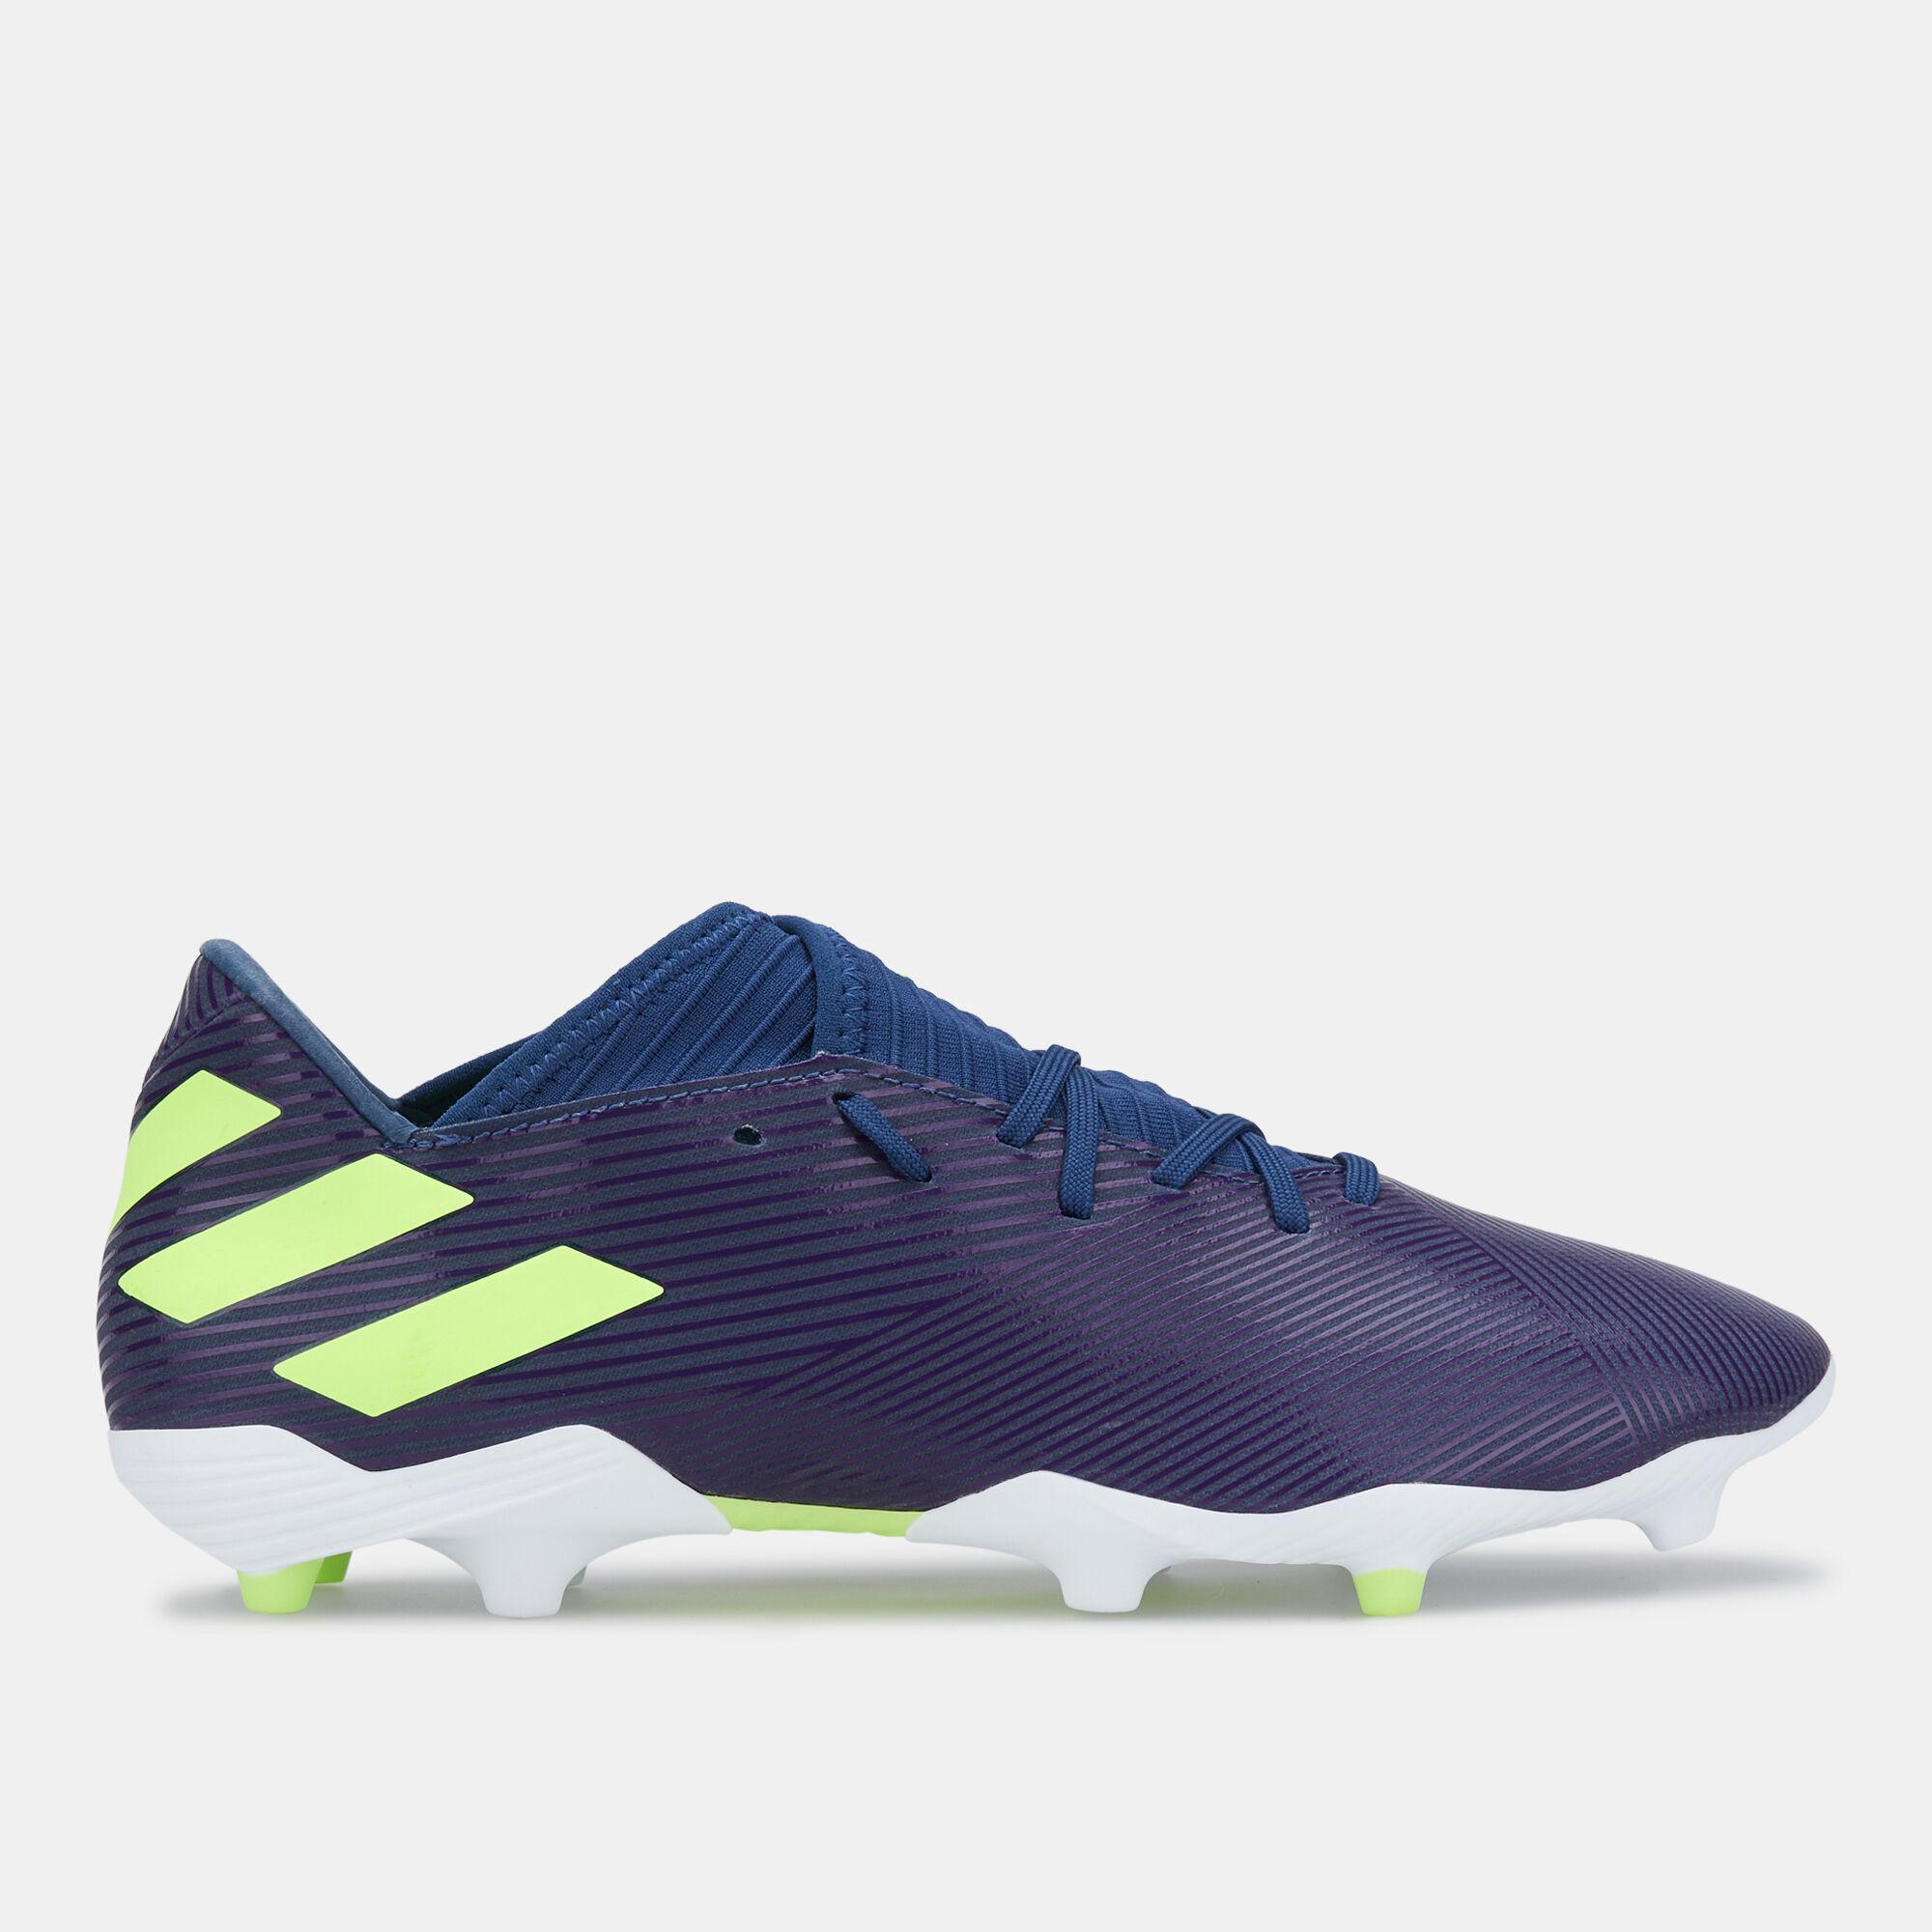 Men's Sports Football Shoes, Online